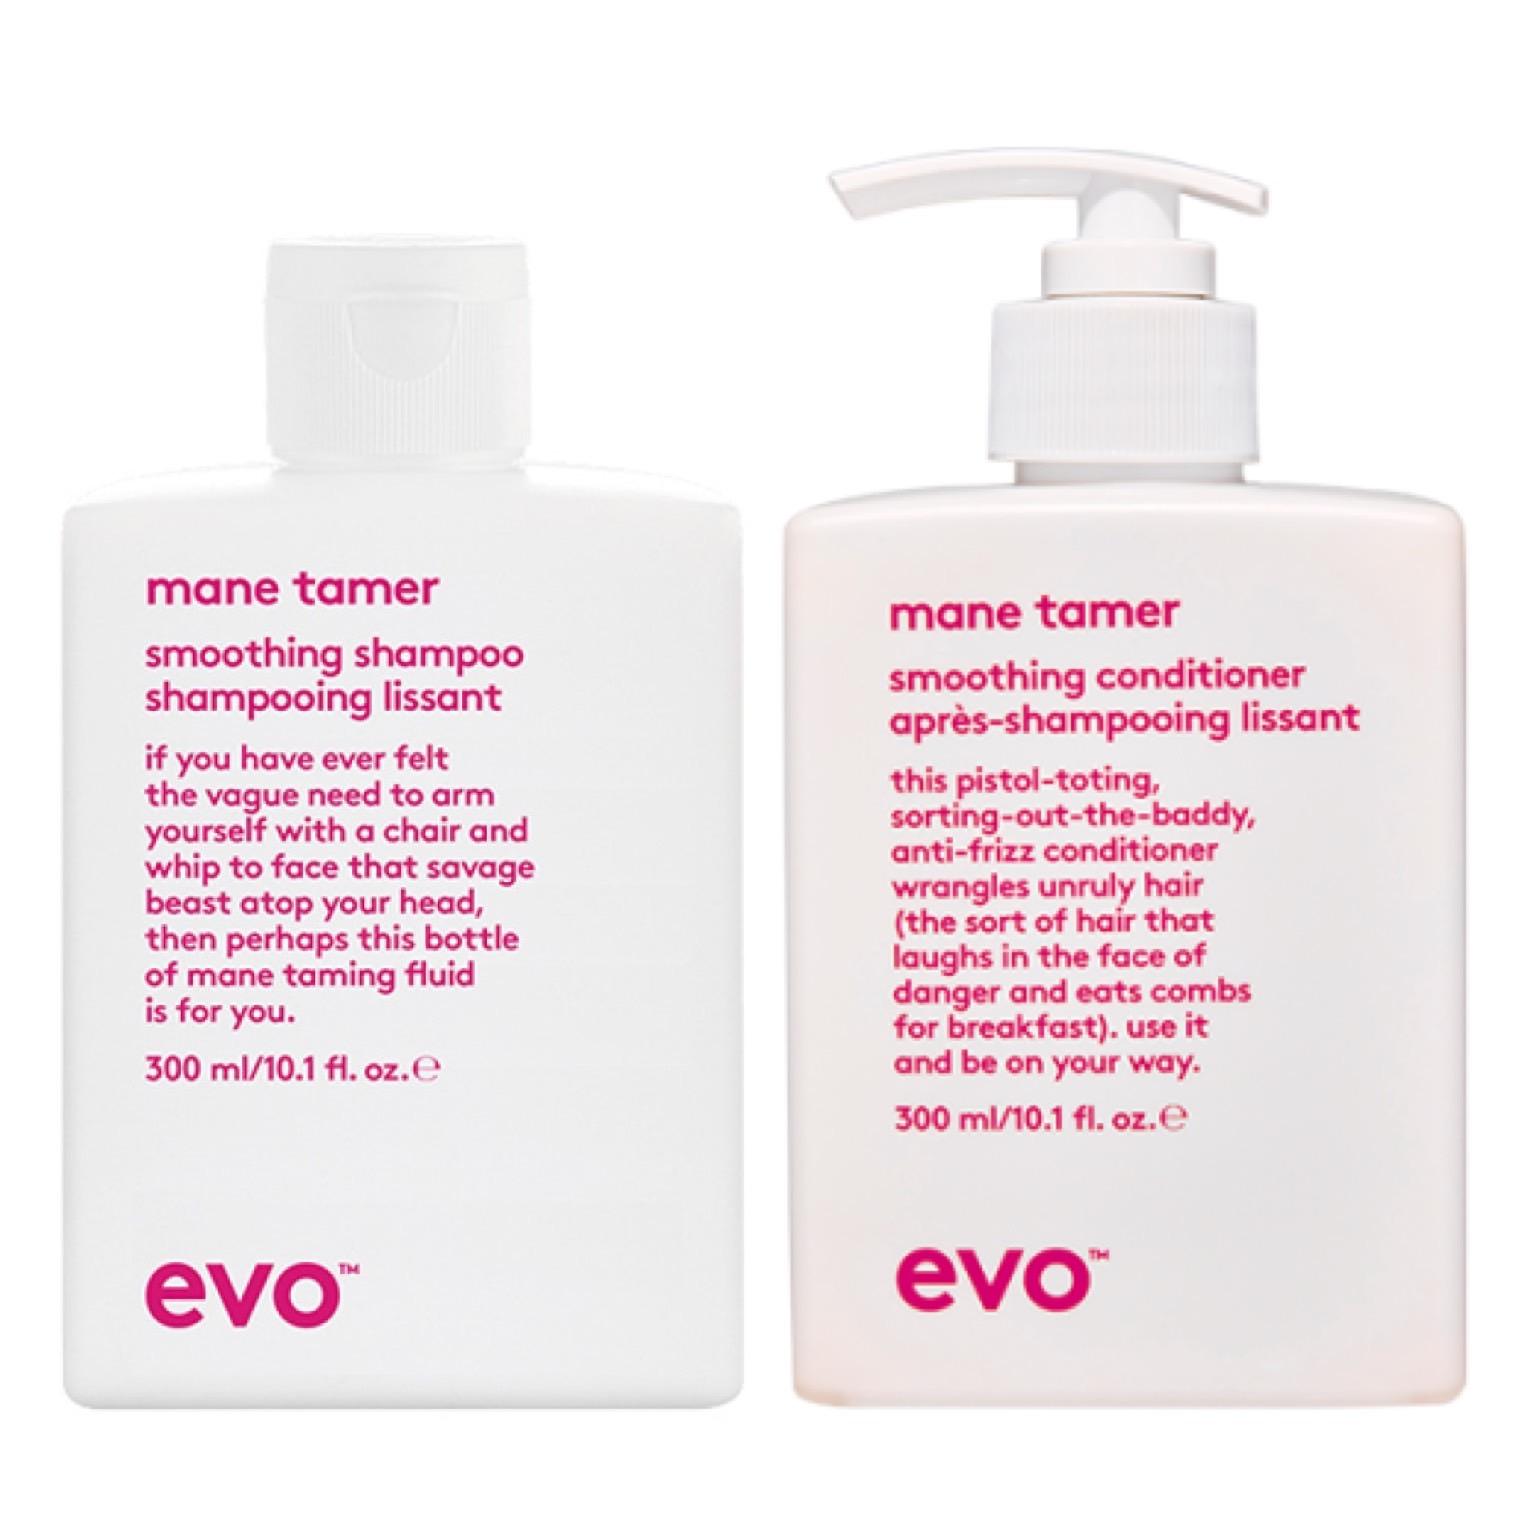 evo Mane Tamer Smoothing Shampoo 300 ml + Conditioner 300 ml